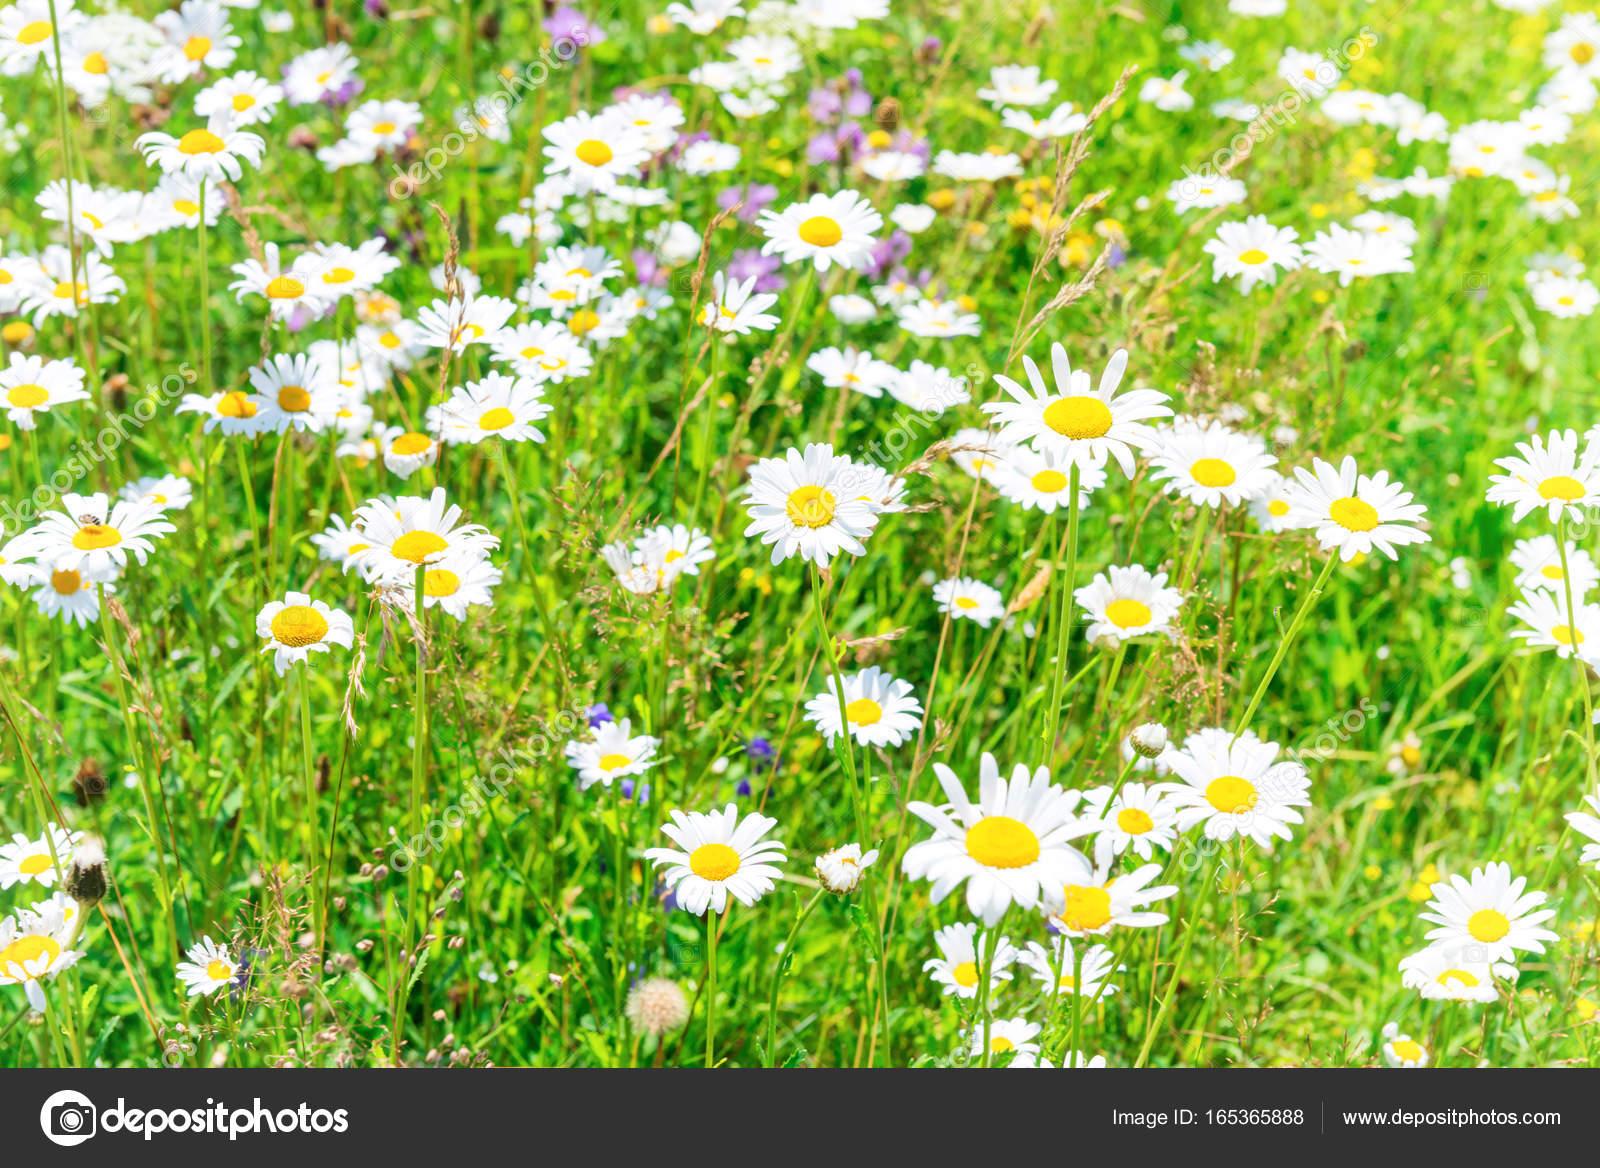 Field of white flowers daisies stock photo dovapi 165365888 field of white flowers daisies stock photo izmirmasajfo